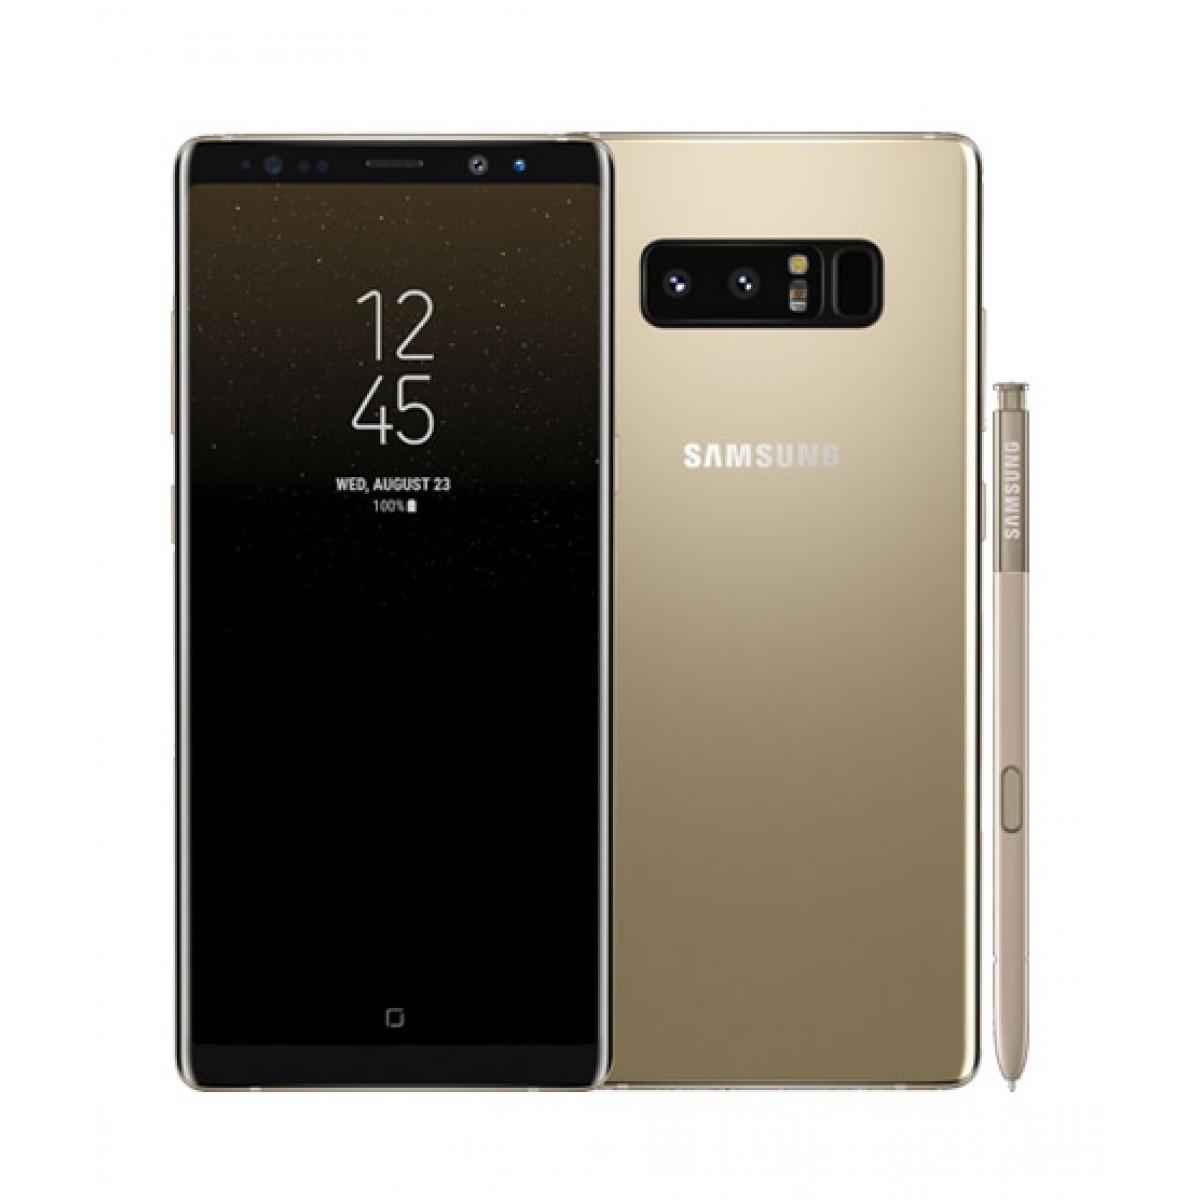 ebdd1c991ce Samsung Galaxy Note 8 Price in Pakistan